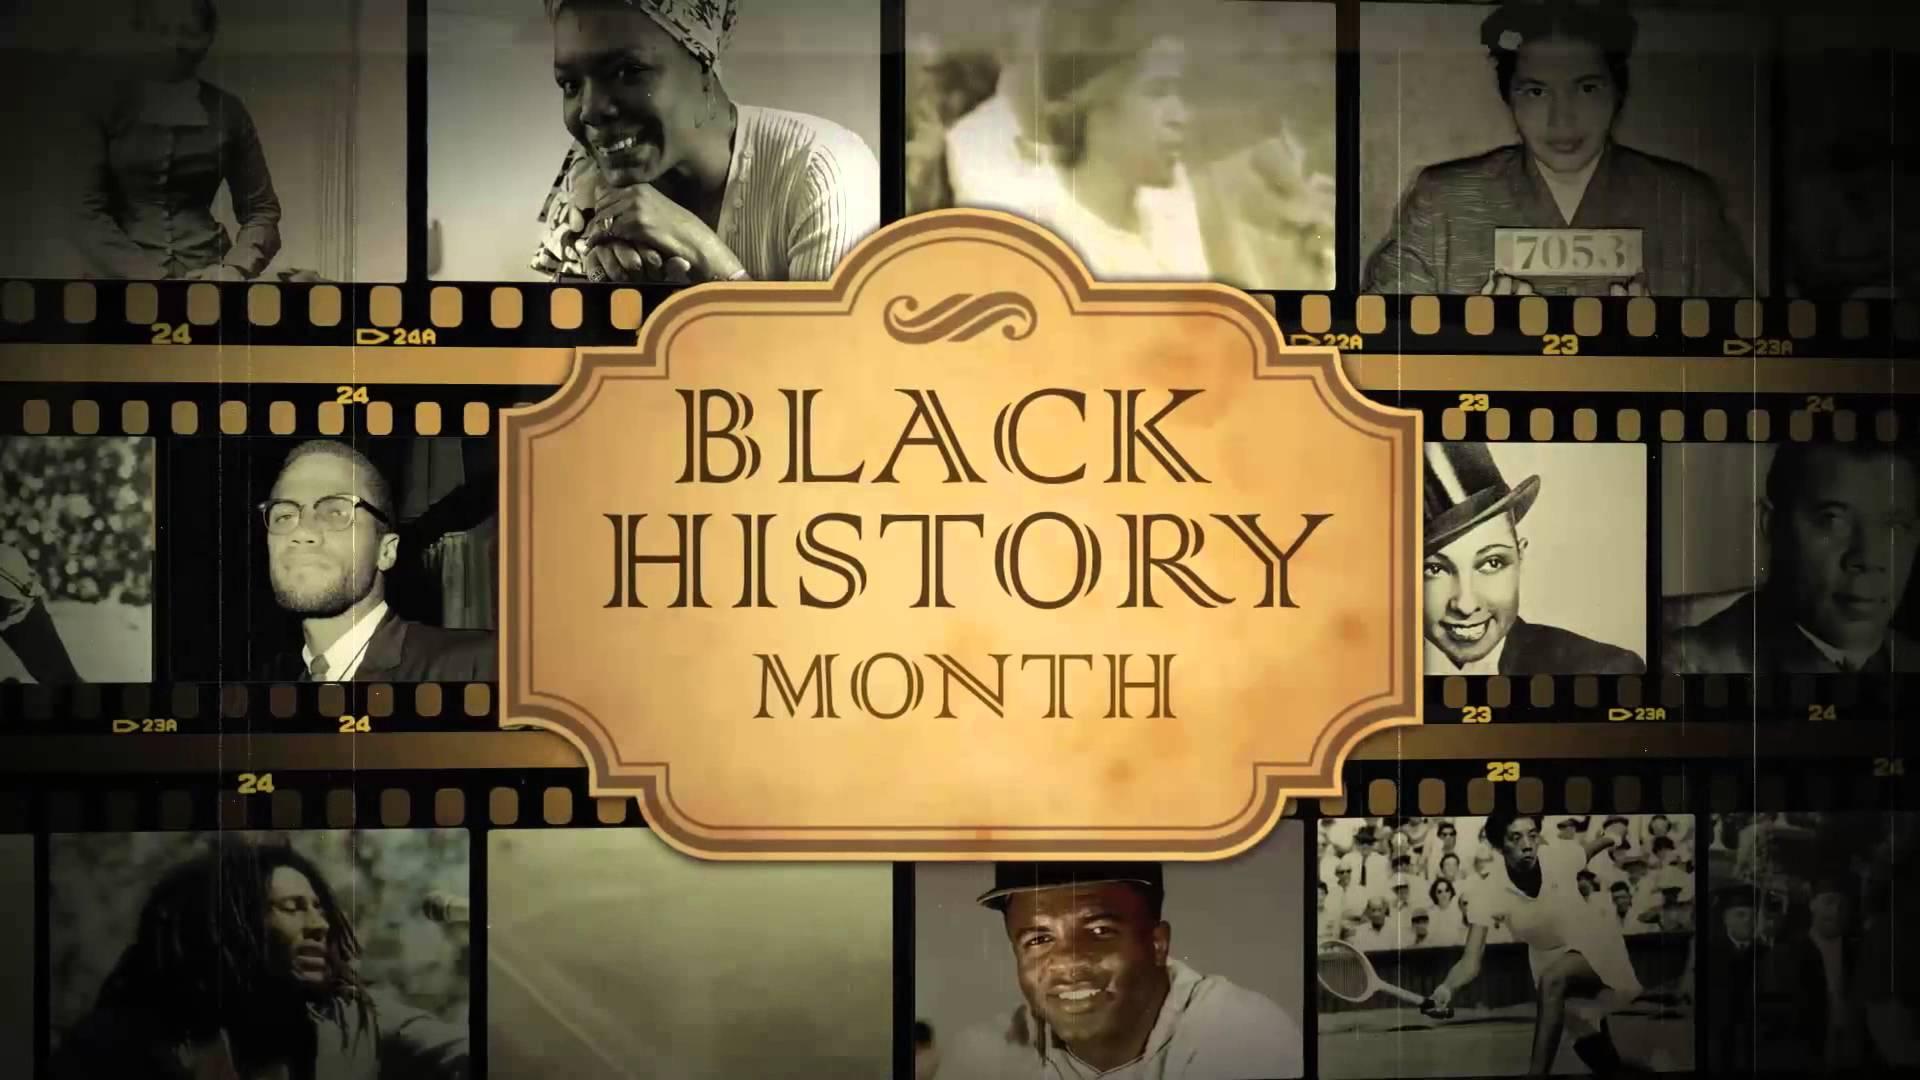 black history wallpaper  Black History Month Wallpapers - Wallpaper Cave